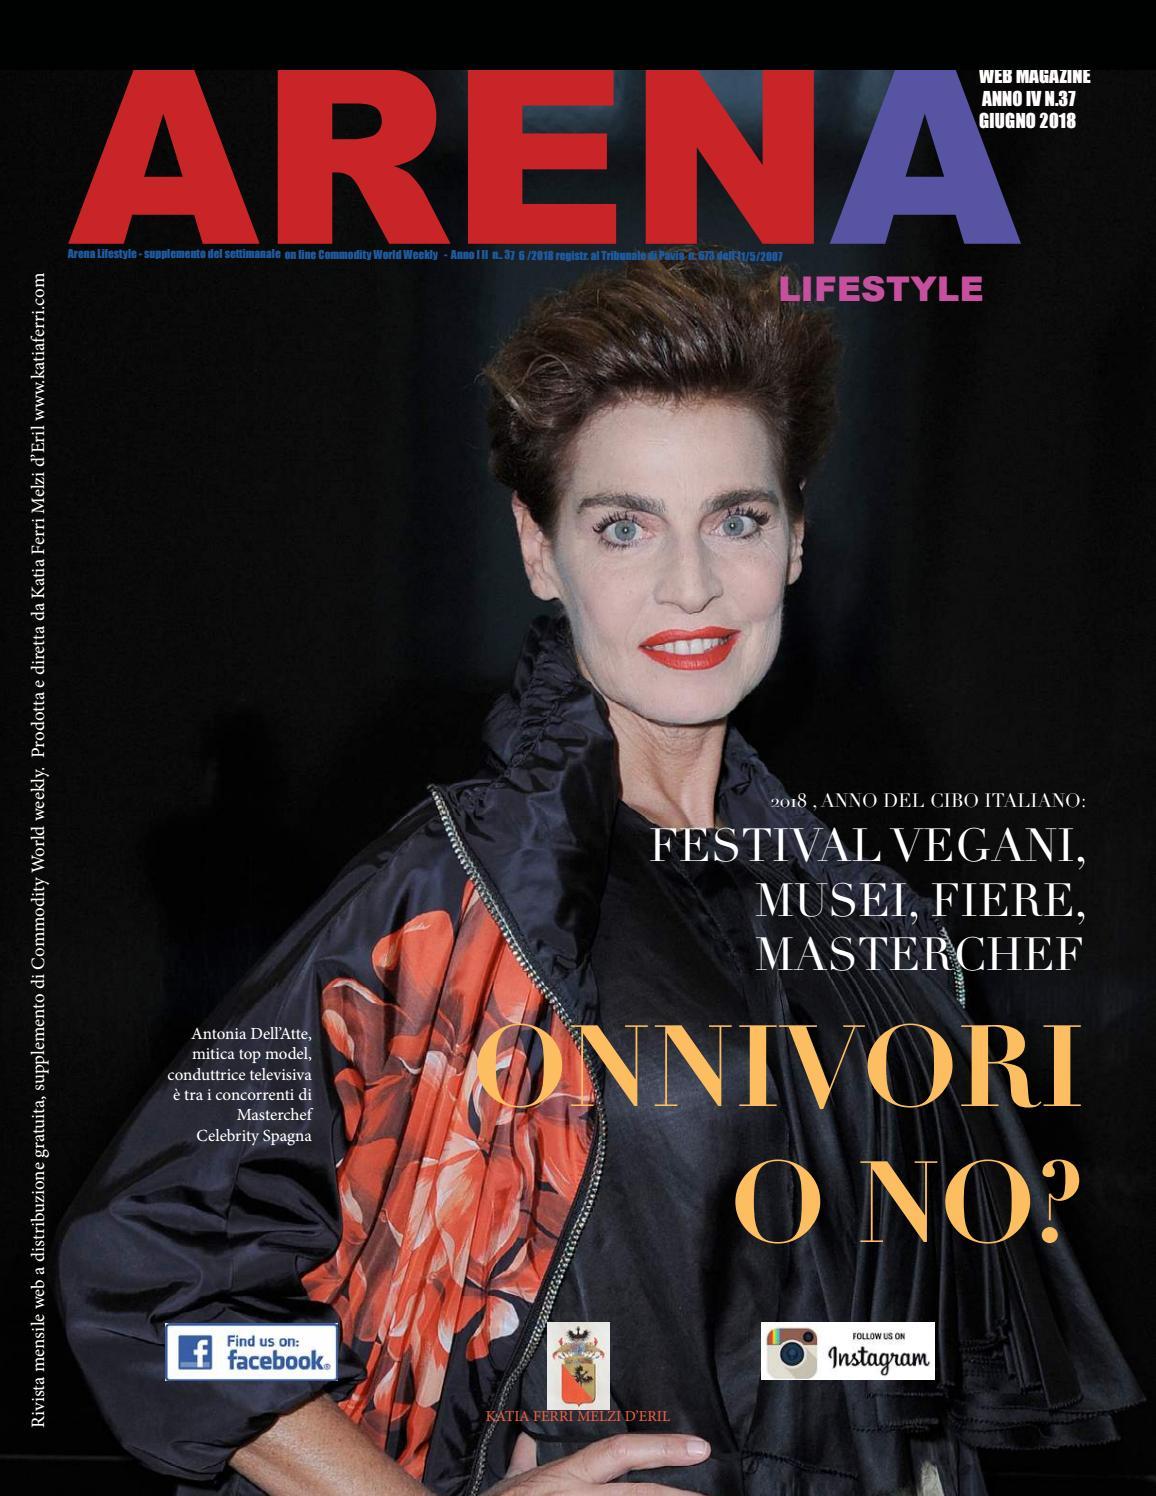 Arena lifestyle 6 2018 by katia Ferri Melzi d Eril - issuu 29f36325d426